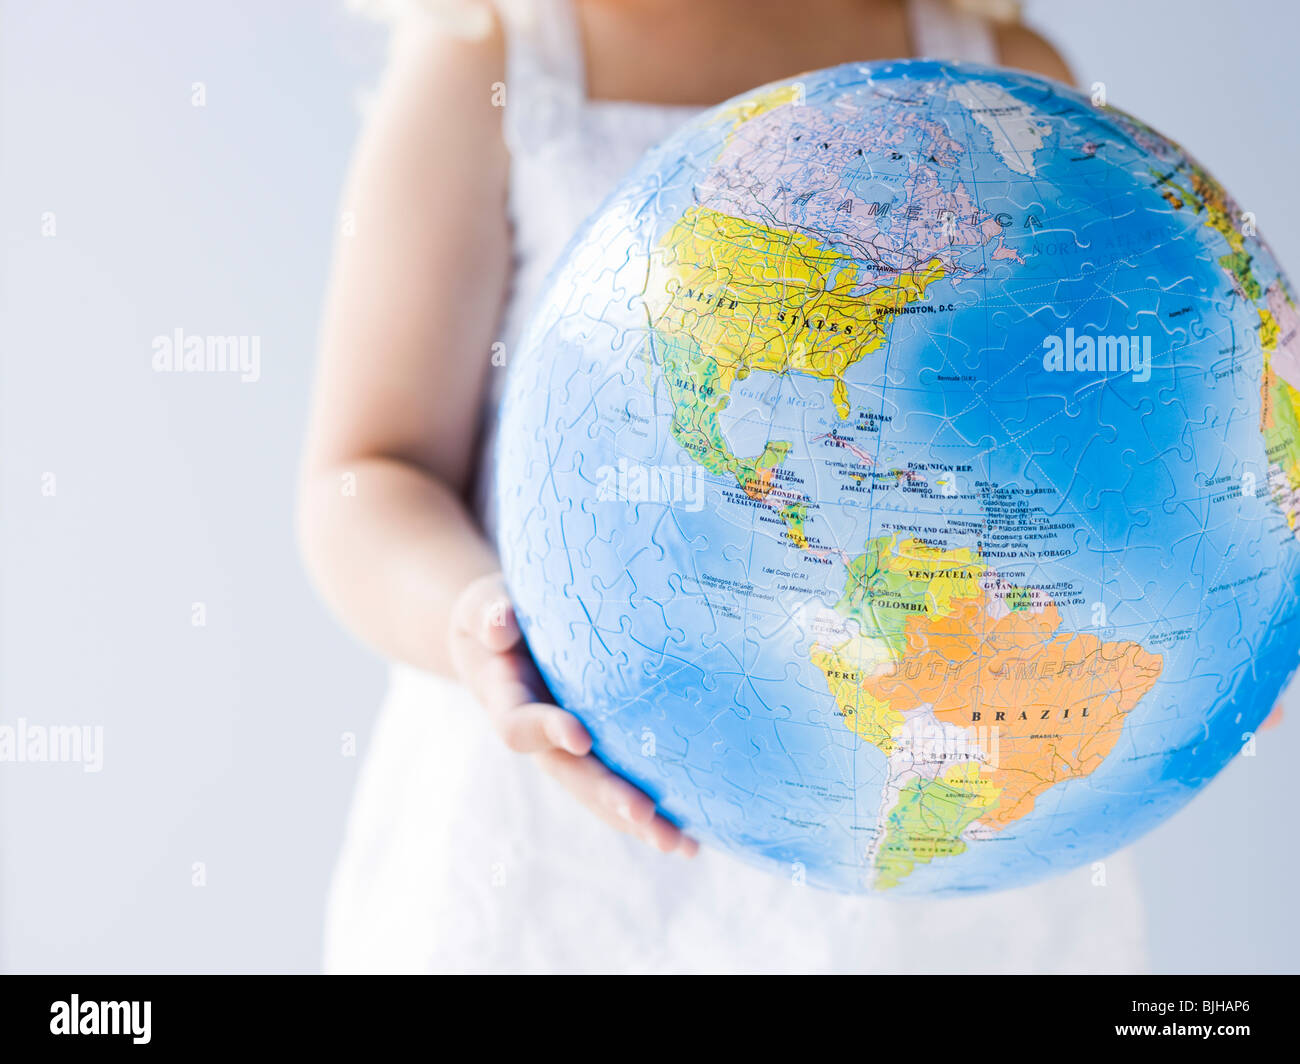 kleines Mädchen hält einen Globus Stockbild